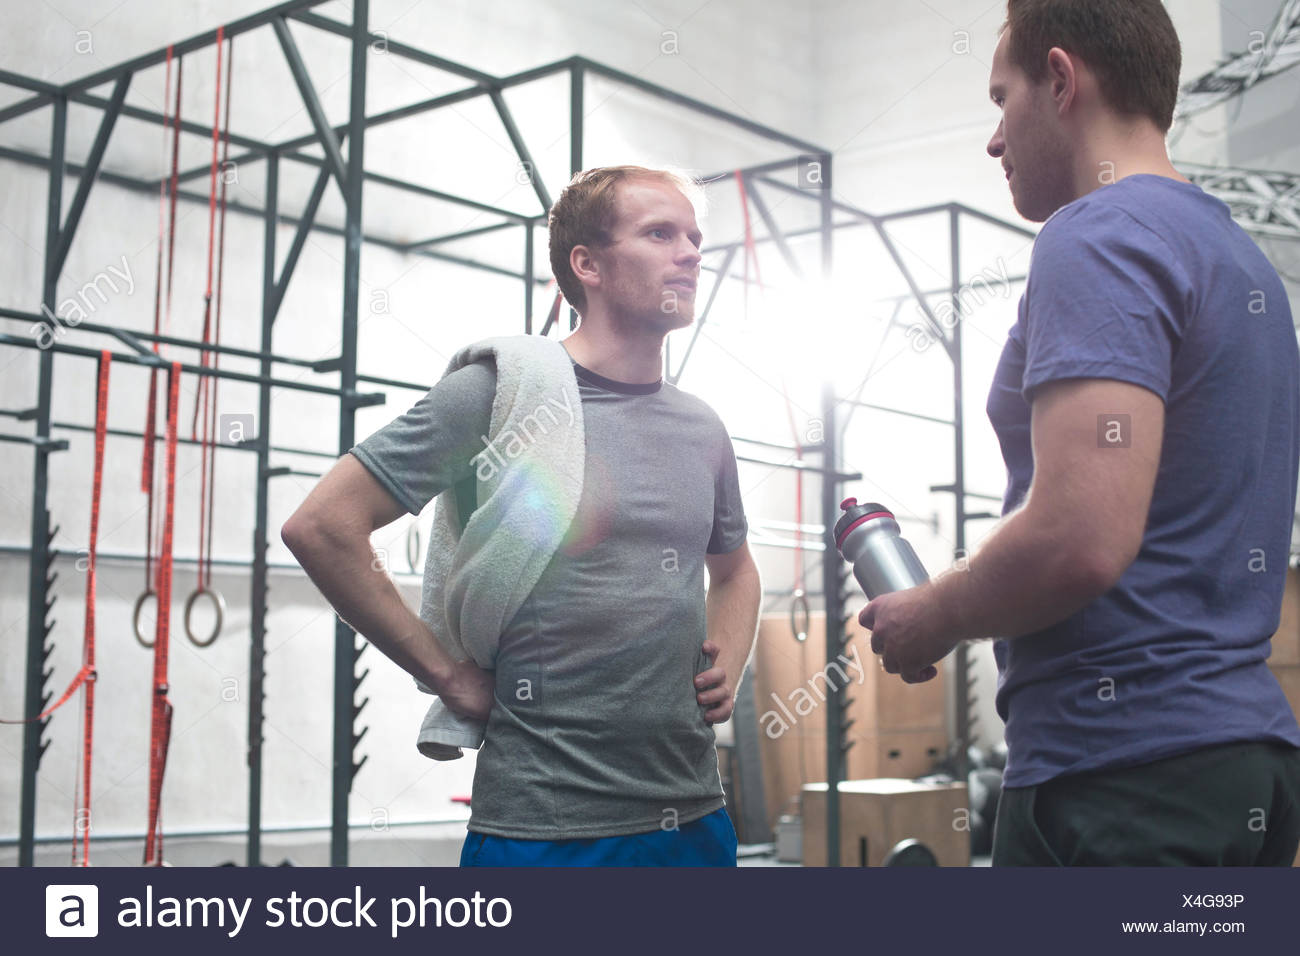 En parlant d'amis masculins gym crossfit Photo Stock